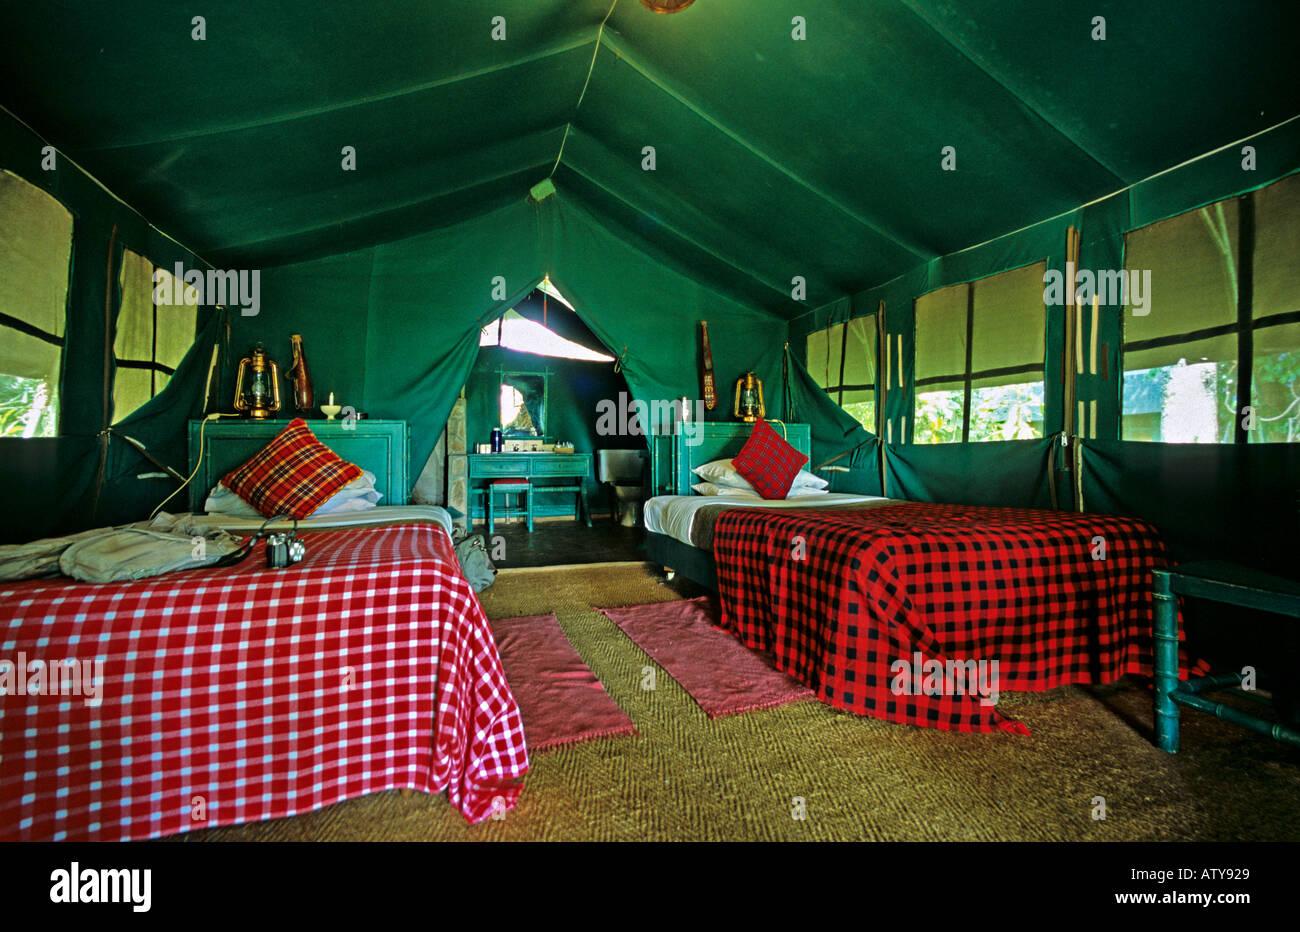 AFRICA KENYA MASAI MARA Interior of luxurious tent at Kichwa Tembo safari camp in the Masai Mara Reserve - Stock Image